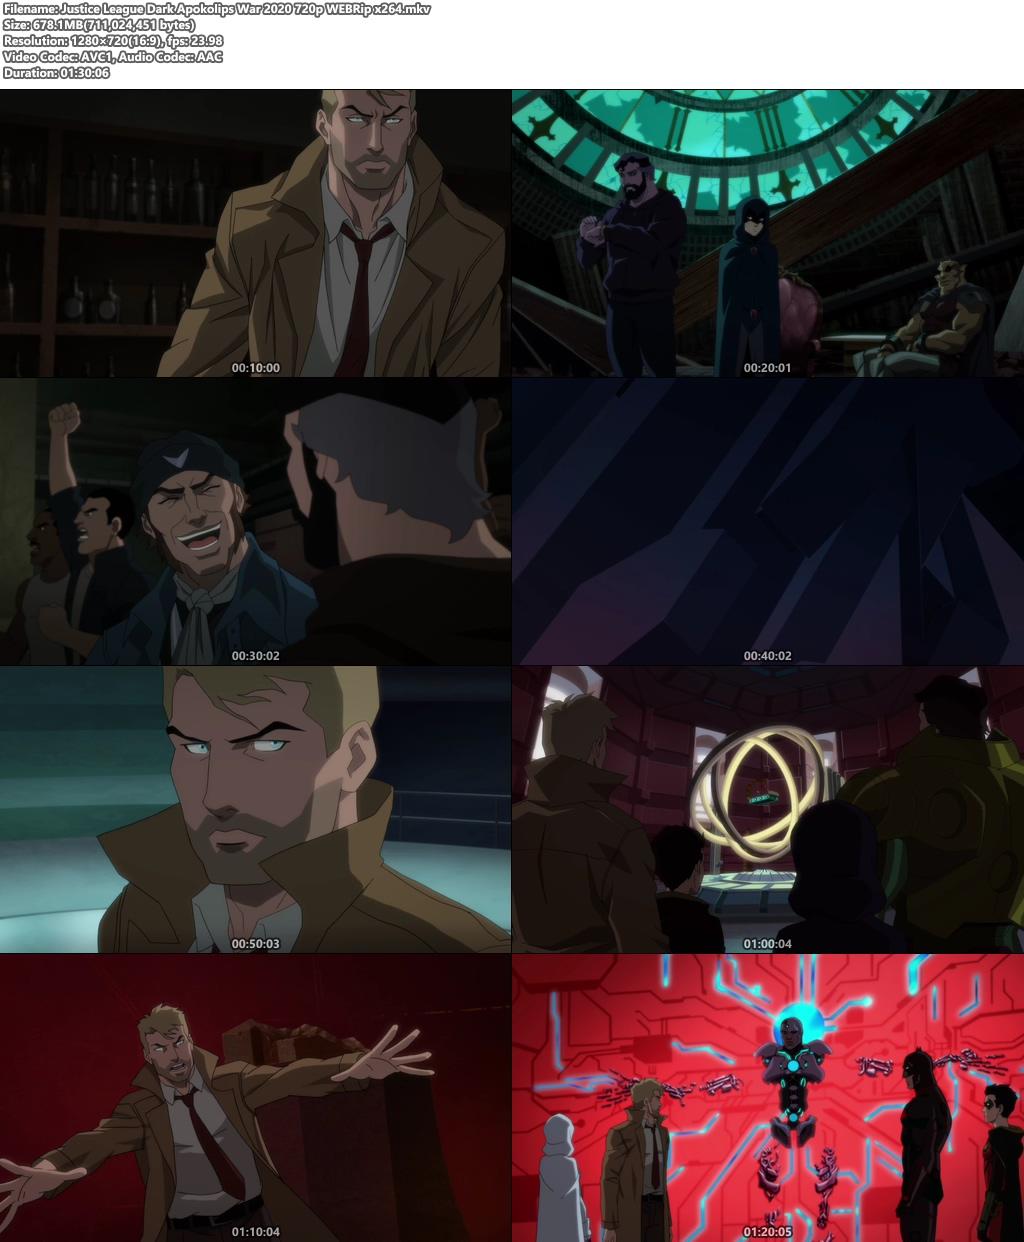 Justice League Dark: Apokolips War 2020